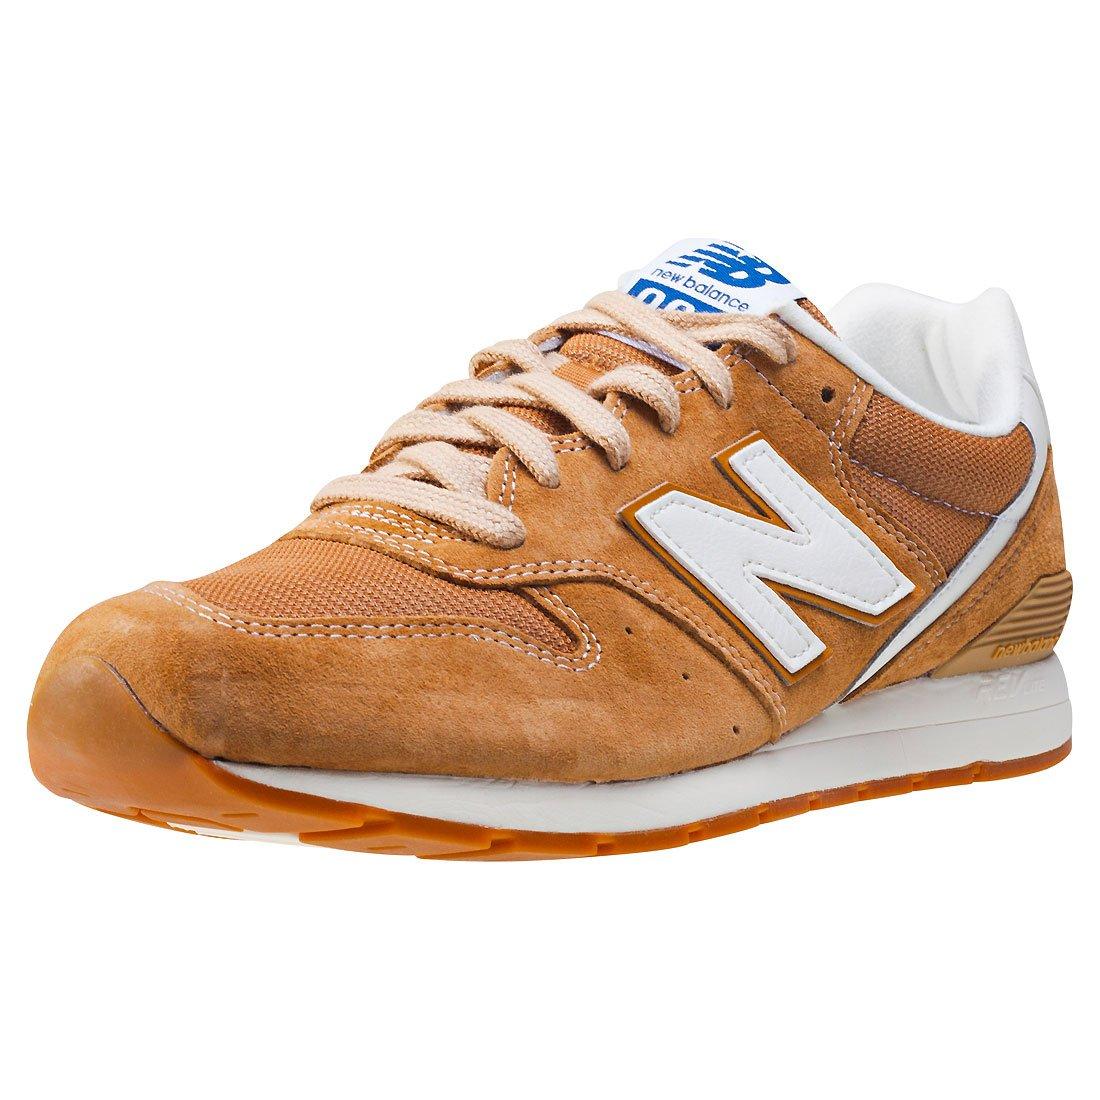 nb 996 marron